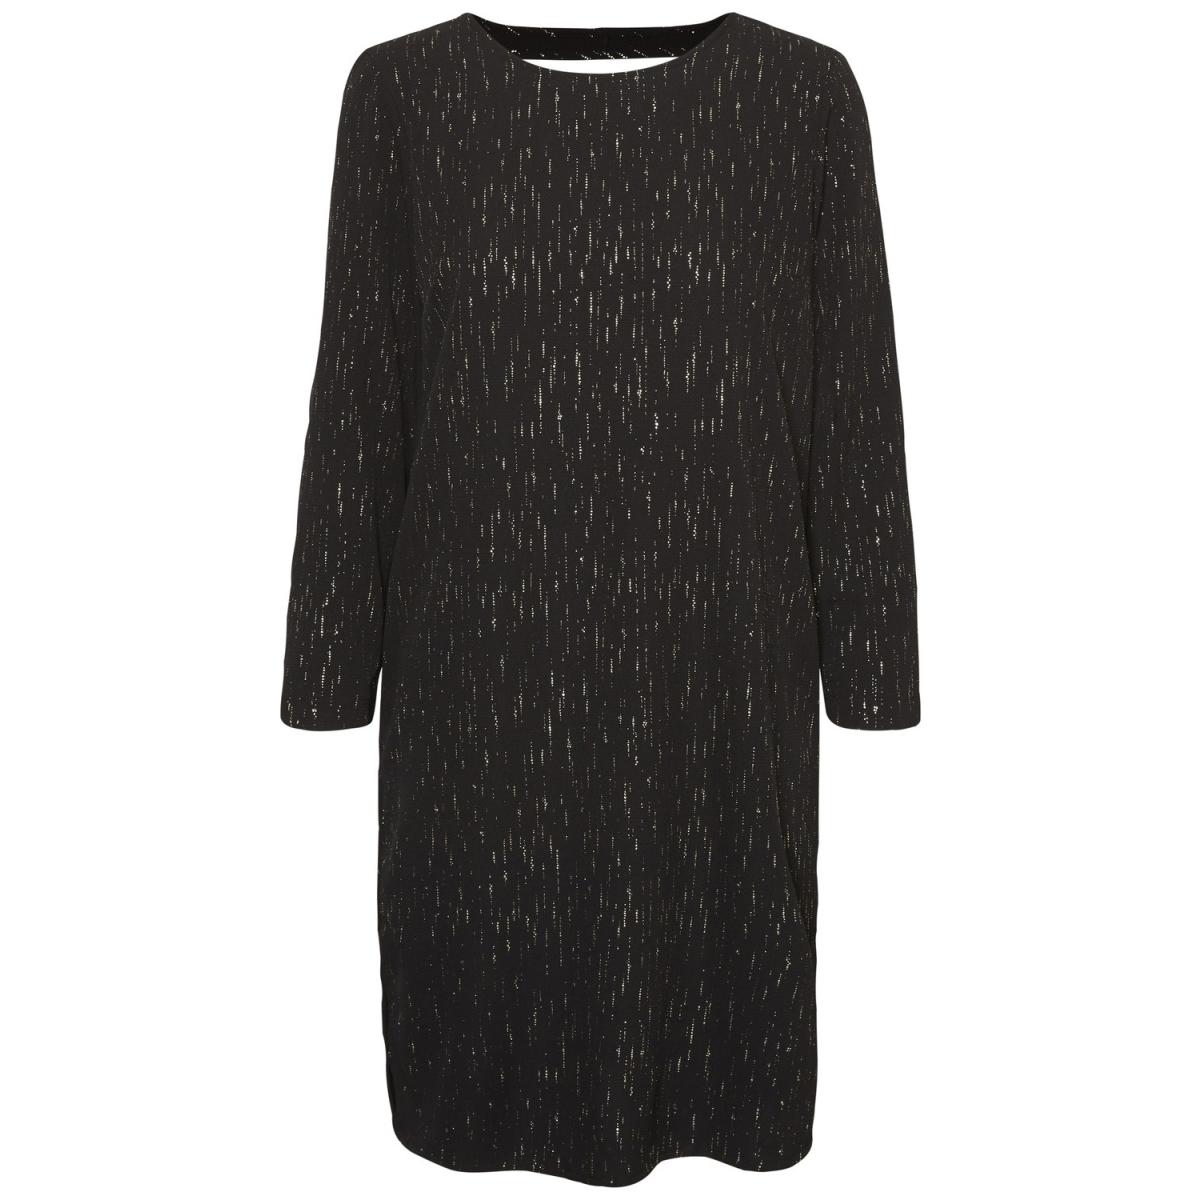 vmbali foil v-neck 3/4 short dress 10197163 vero moda jurk black gold foil